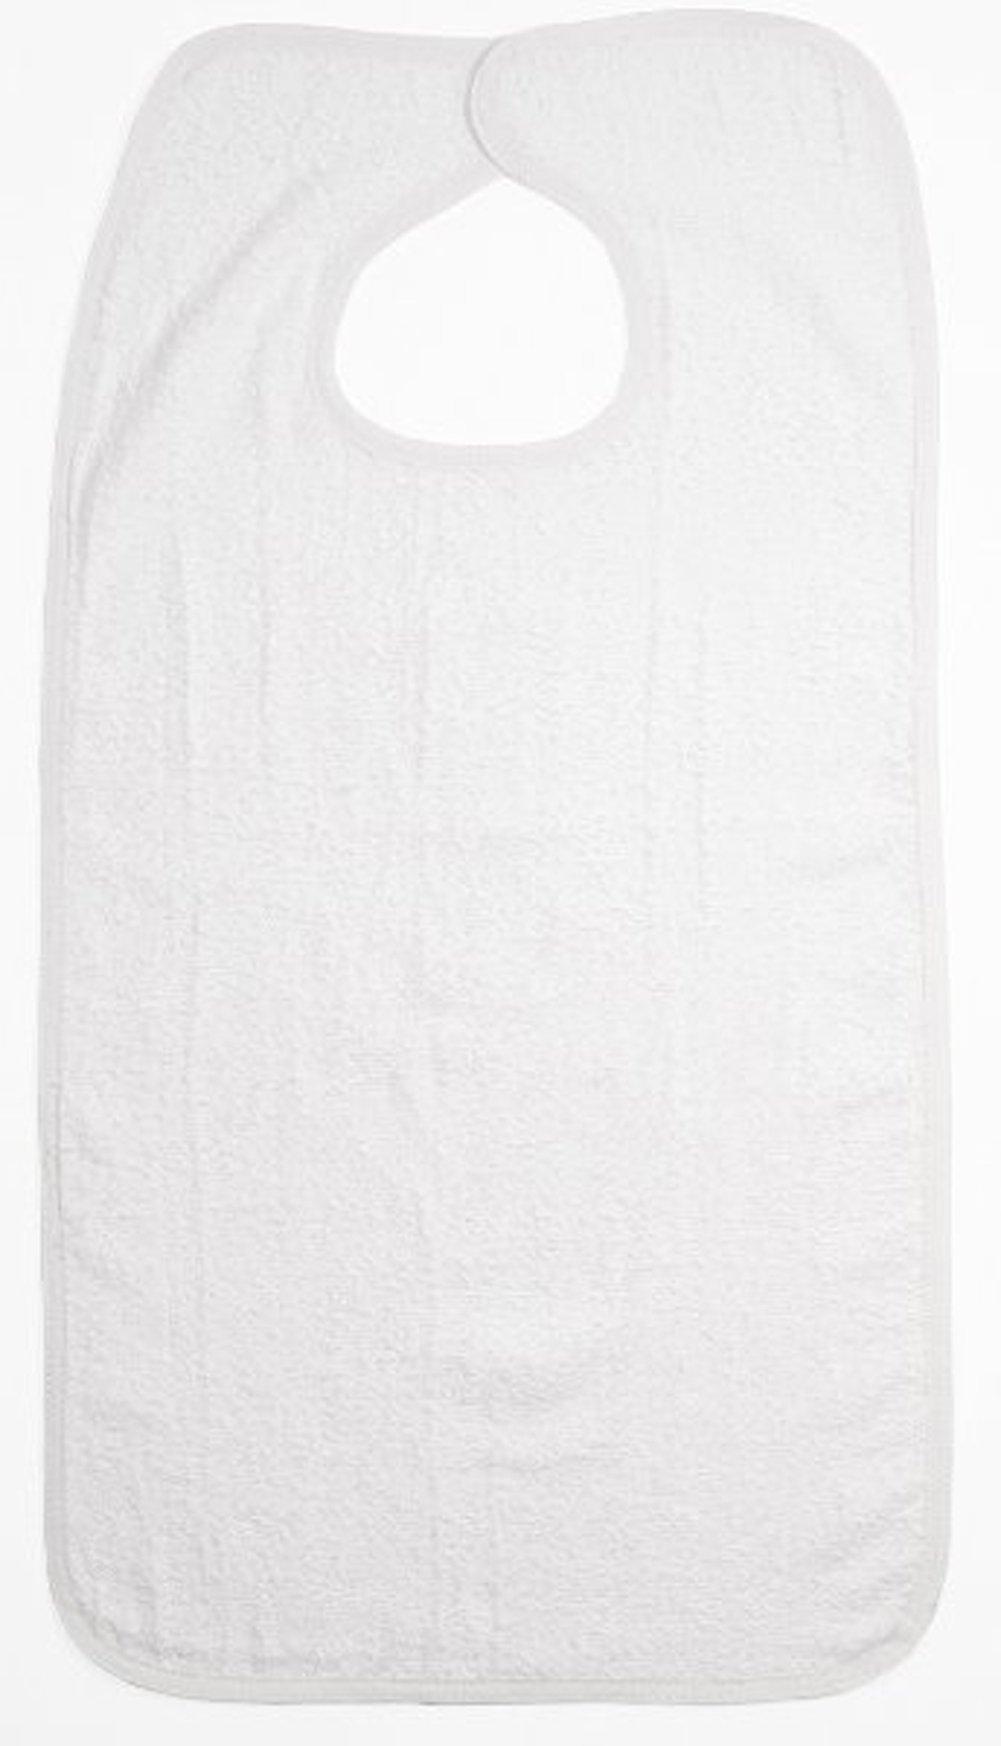 3-Pack - Blue or White Option - 100% Cotton Reusable Terry Adult Bib - Patient Bib (White )